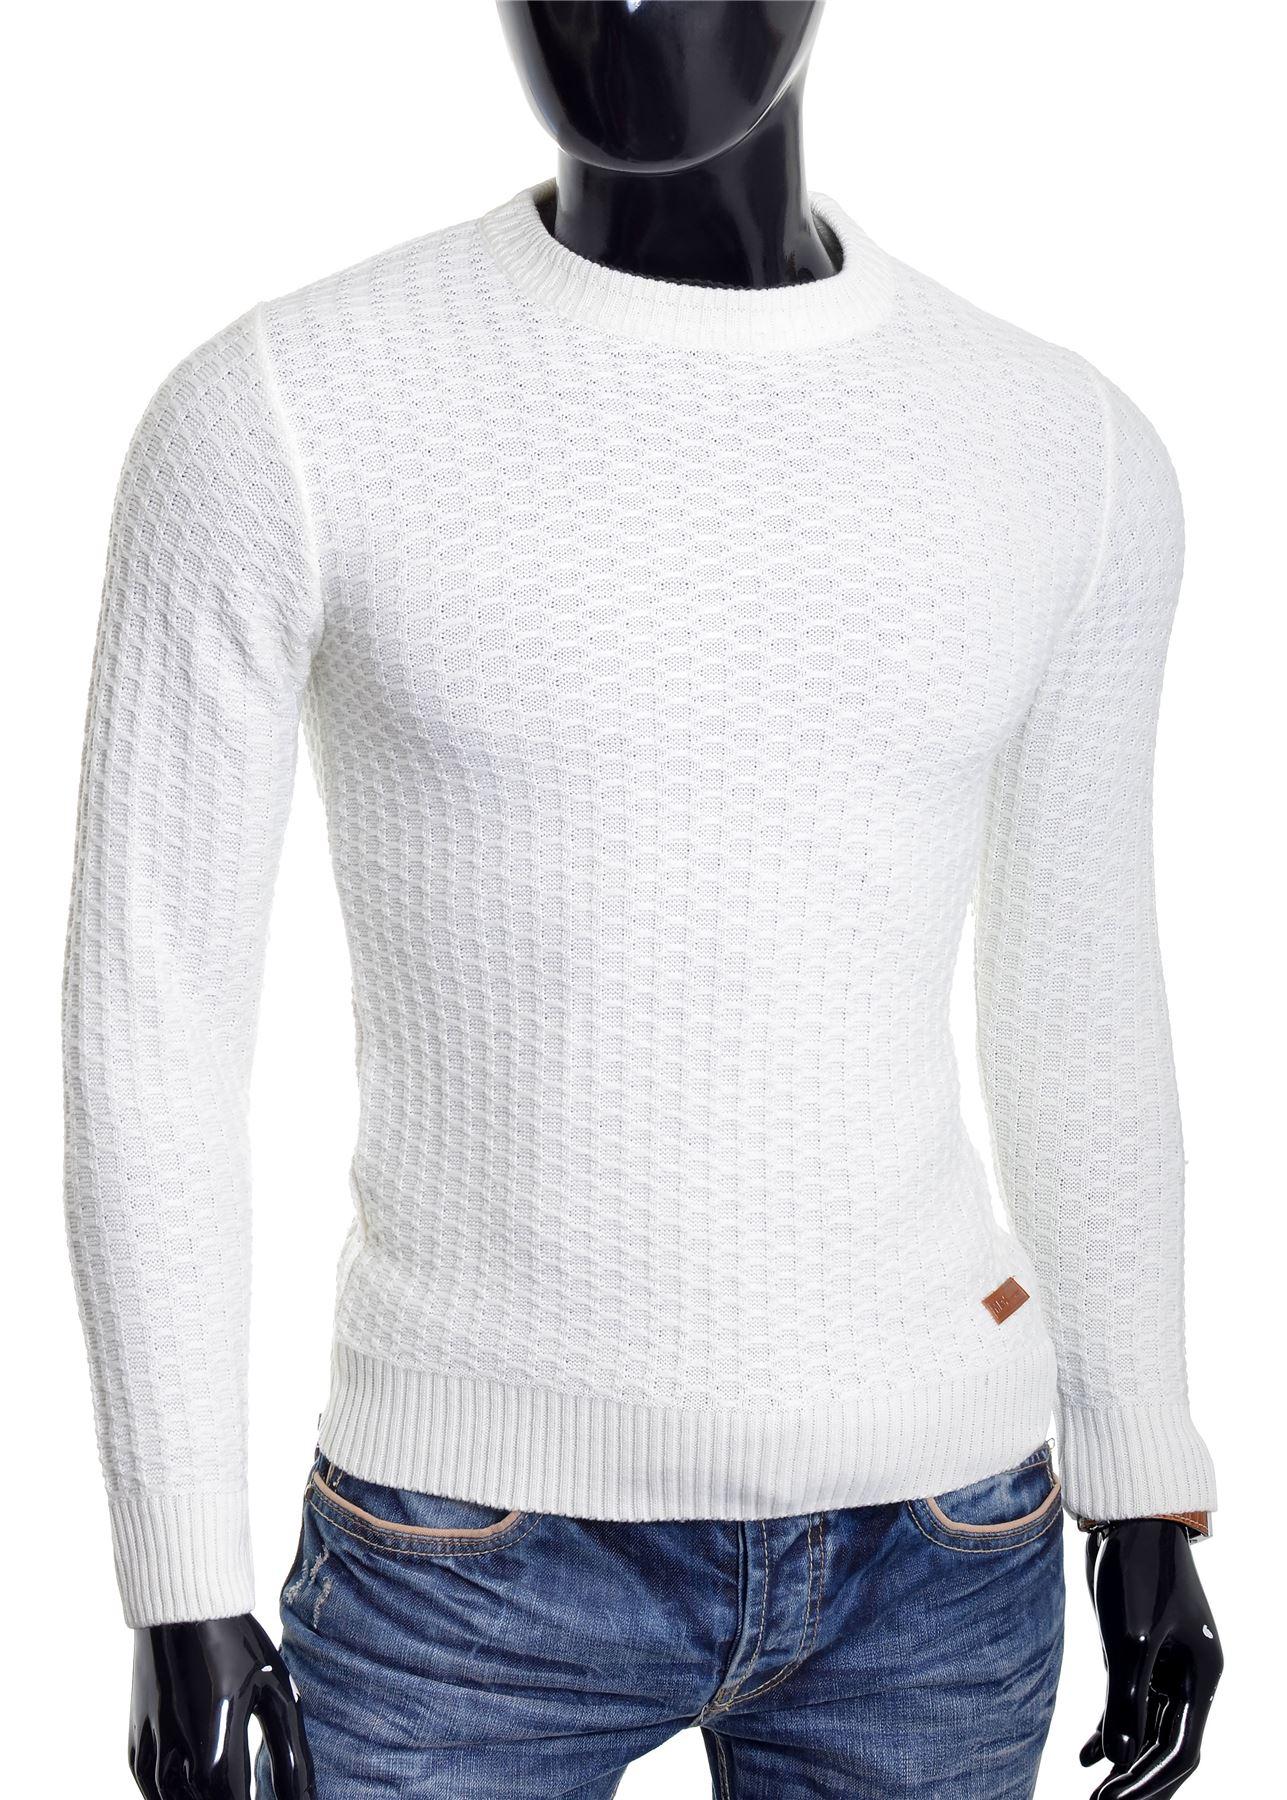 D-amp-R-Men-039-s-Wool-Knit-Jumper-Smart-Long-Sleeve-Sweater-Crew-Neck-Top thumbnail 8